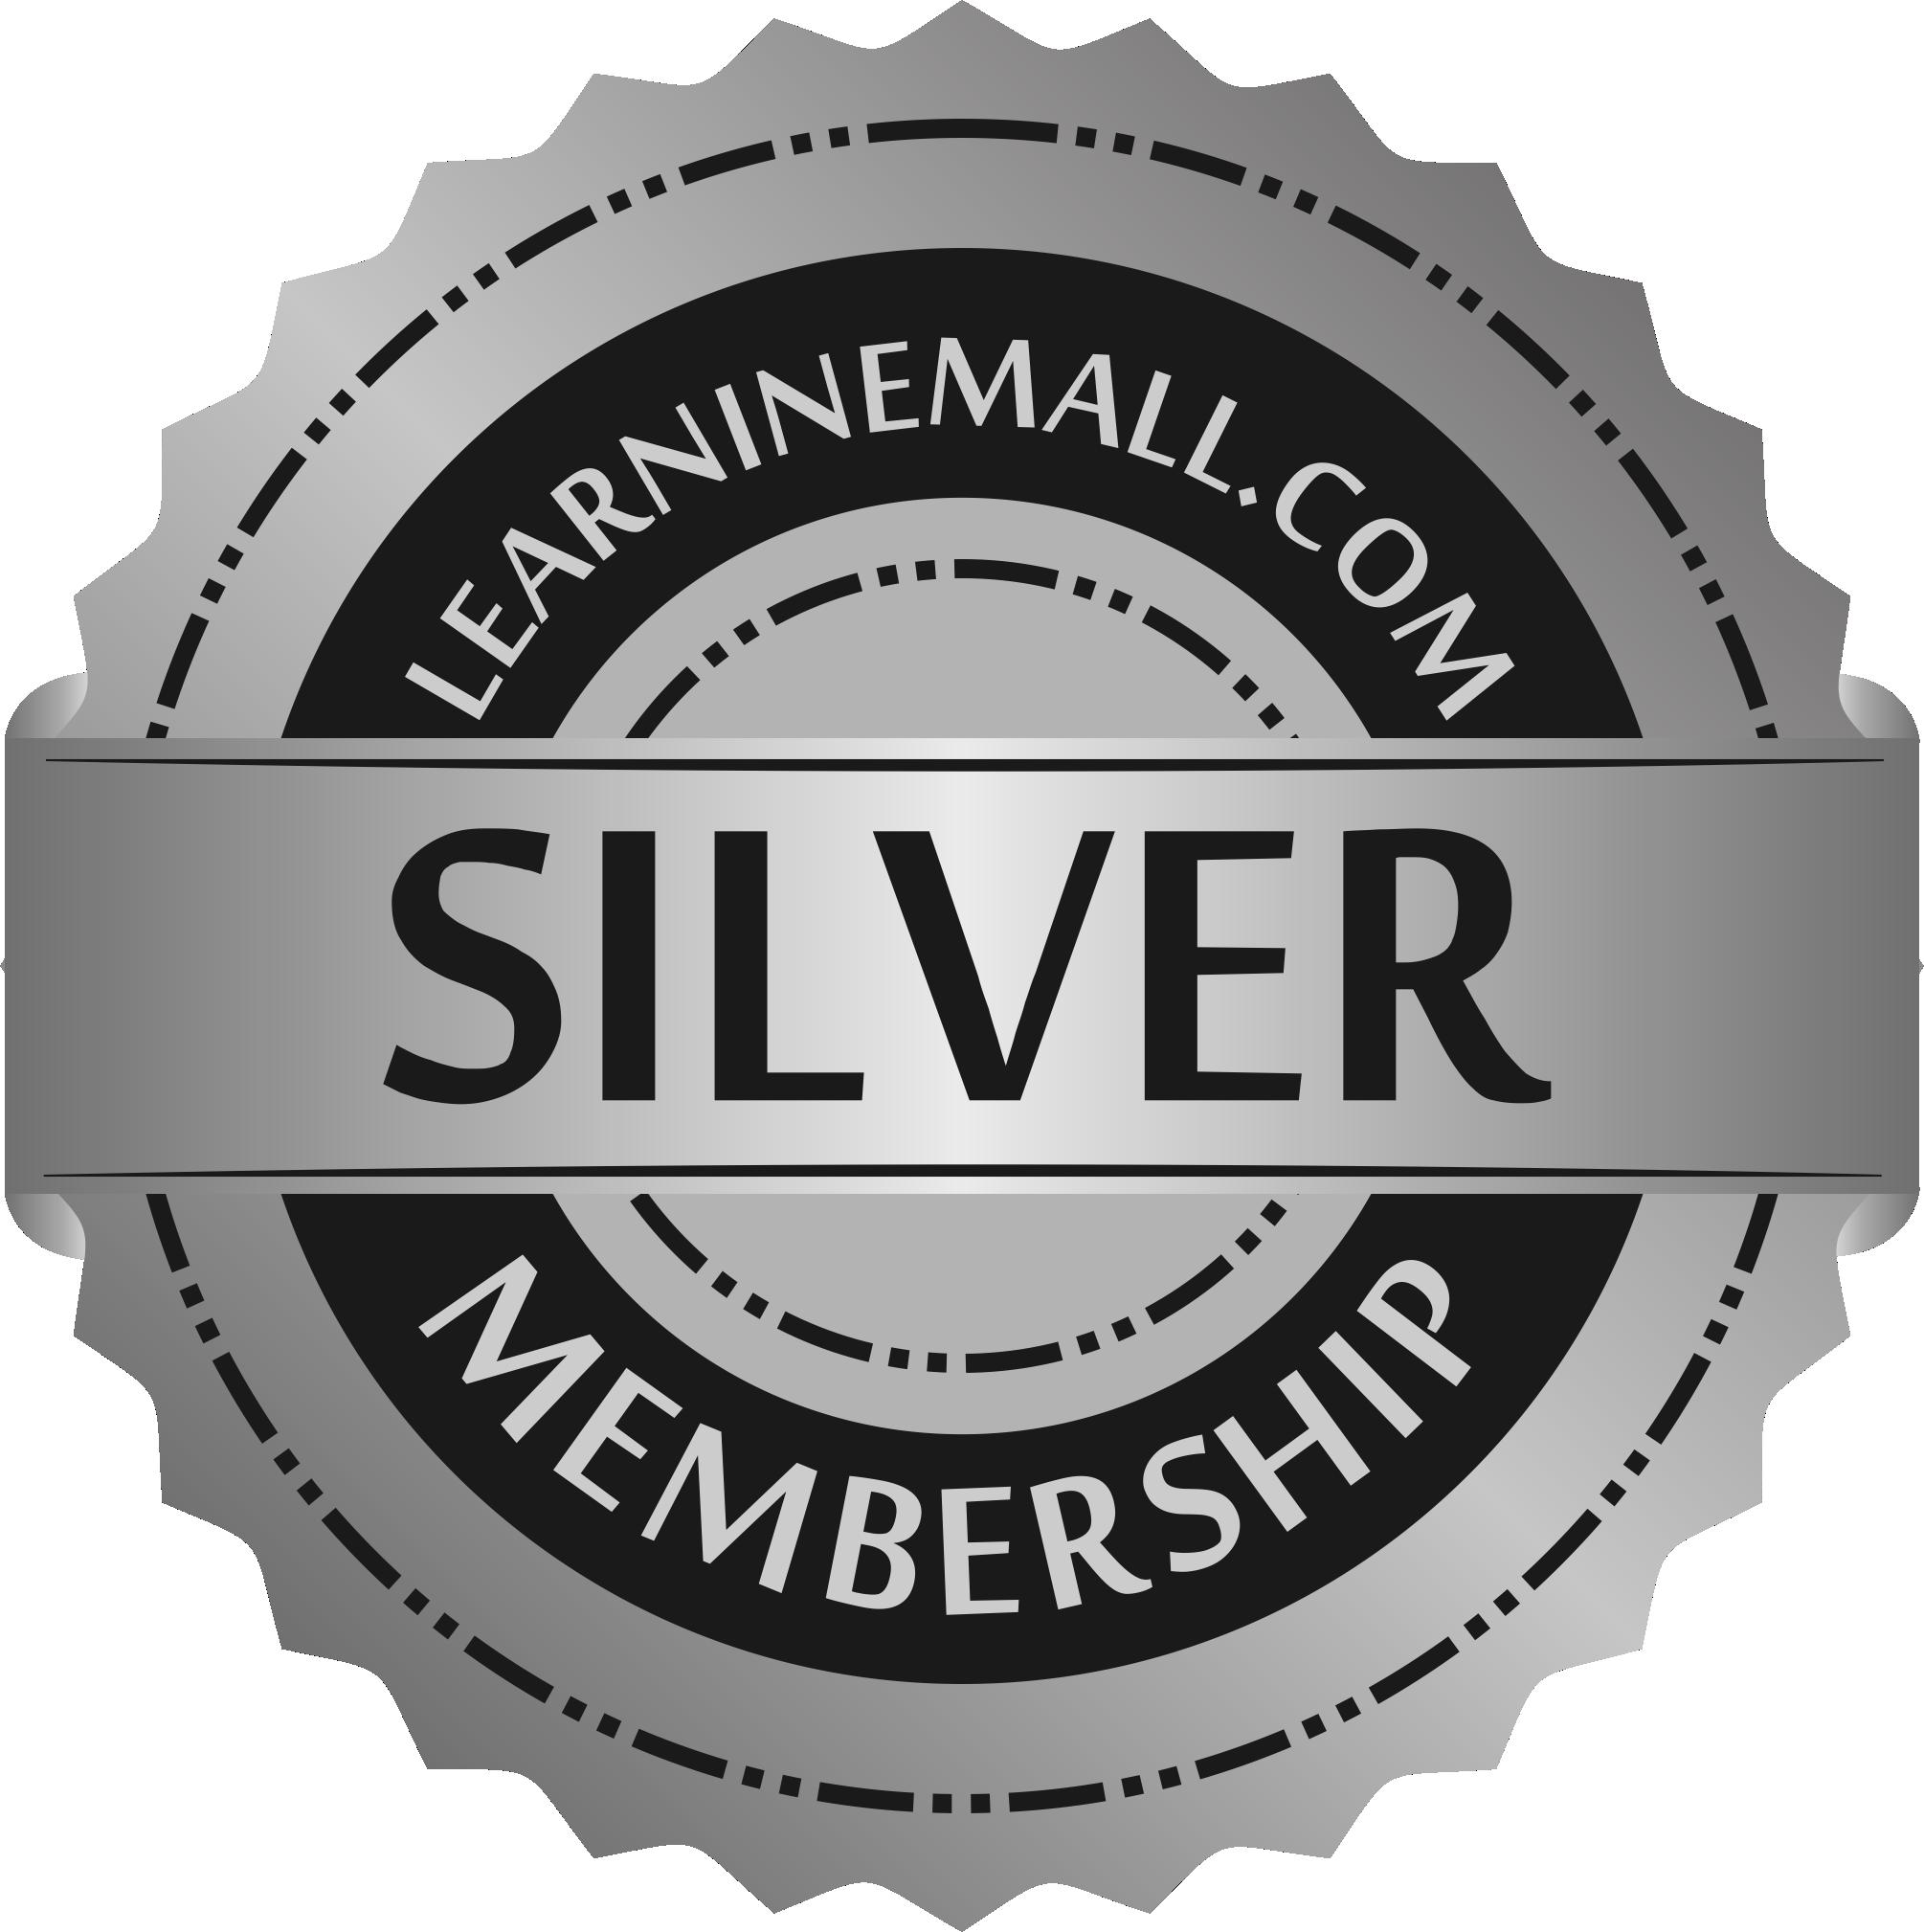 Learninemall Silver Membership Badge